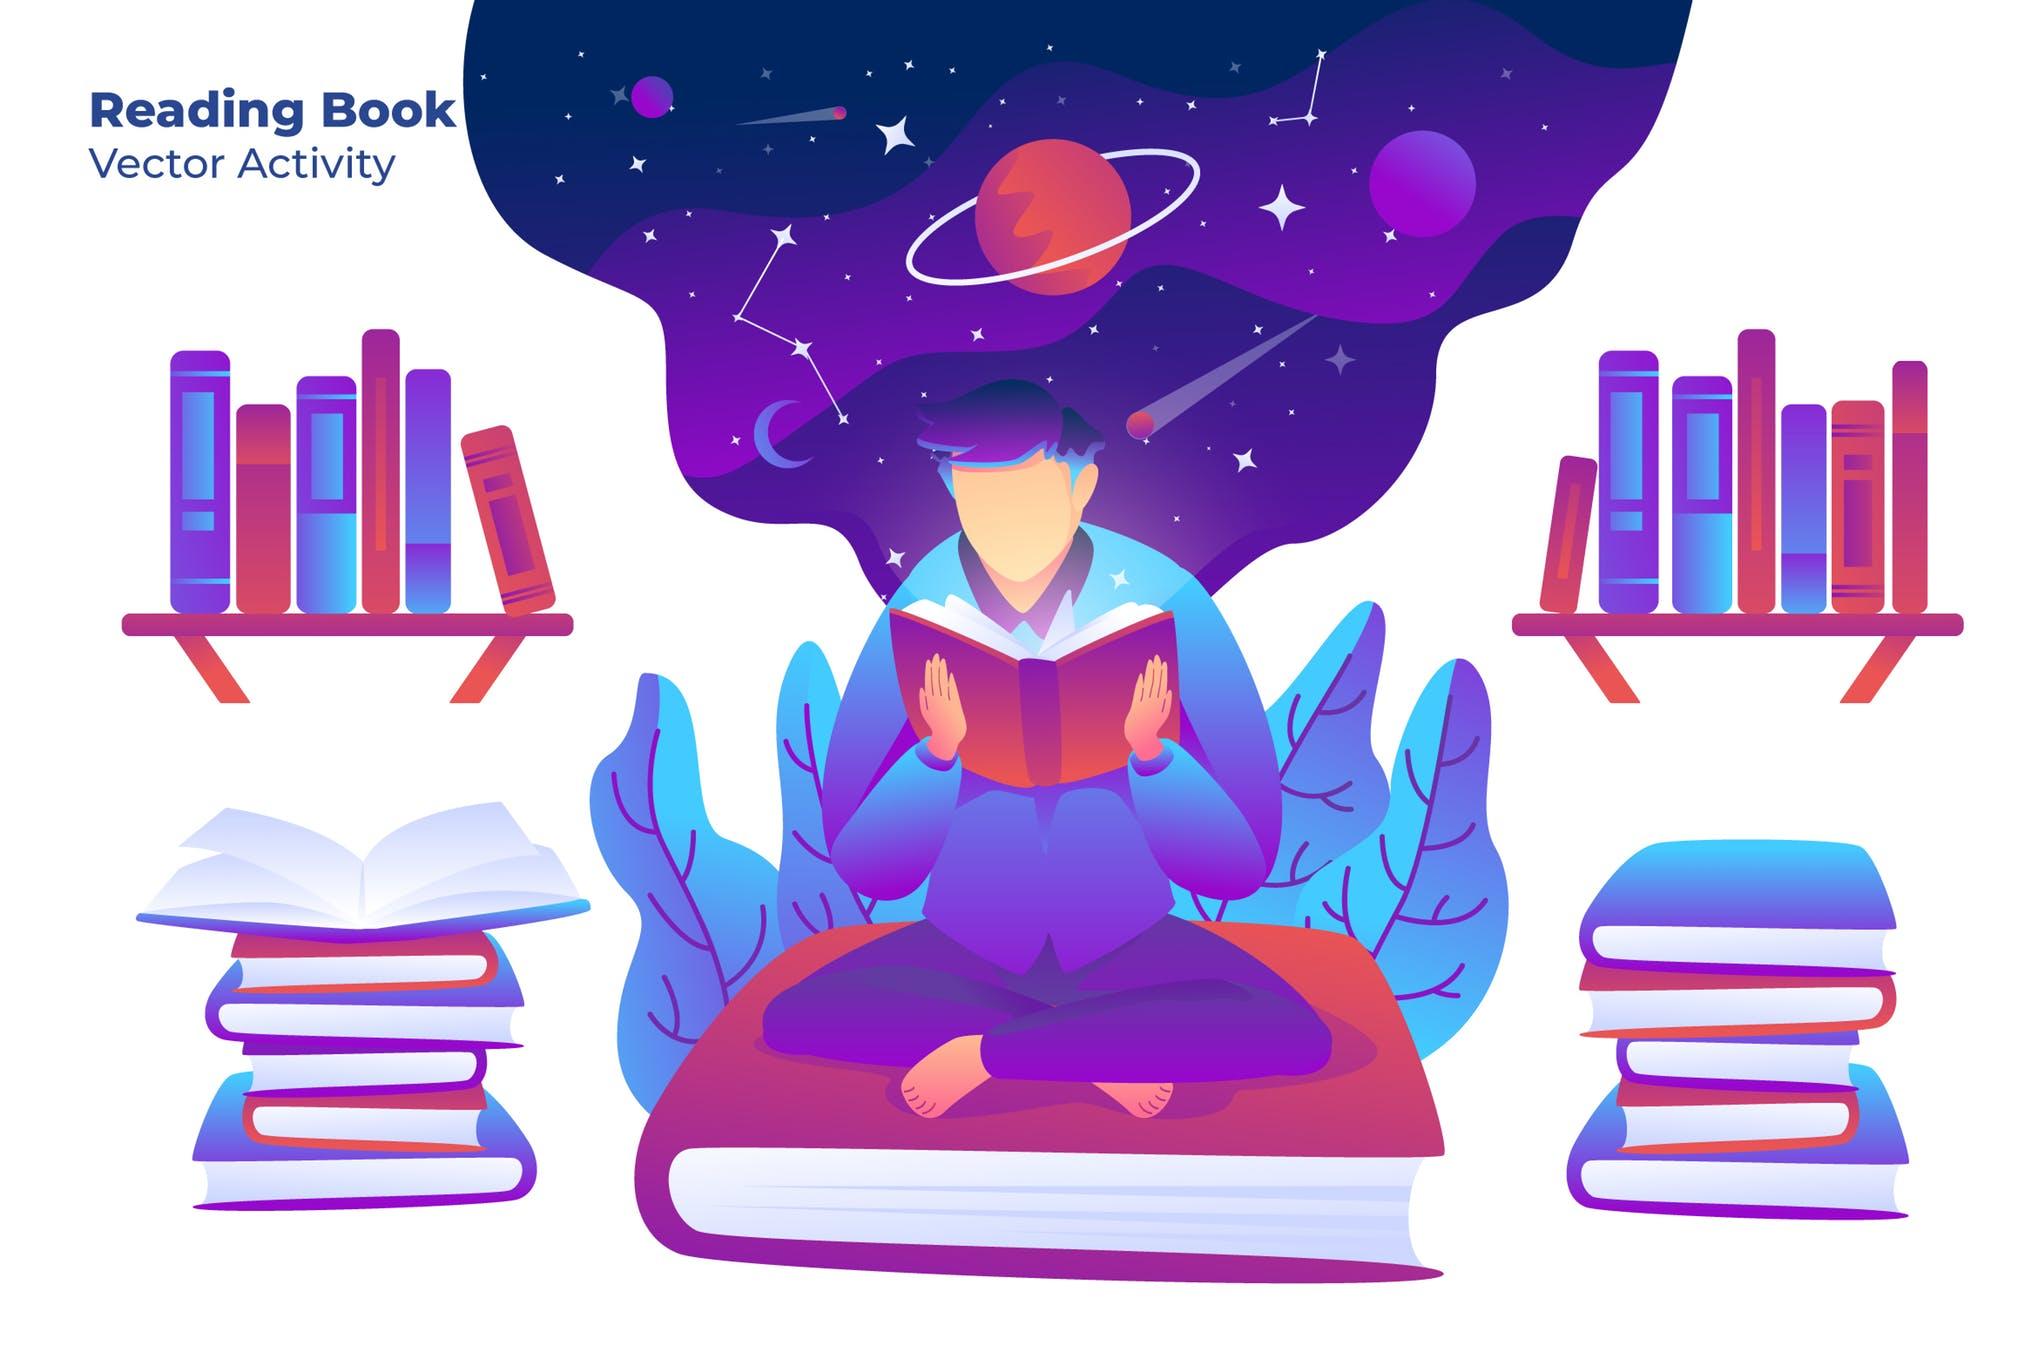 学习阅读场景插画素材下载Reading Book - Vector Illustration